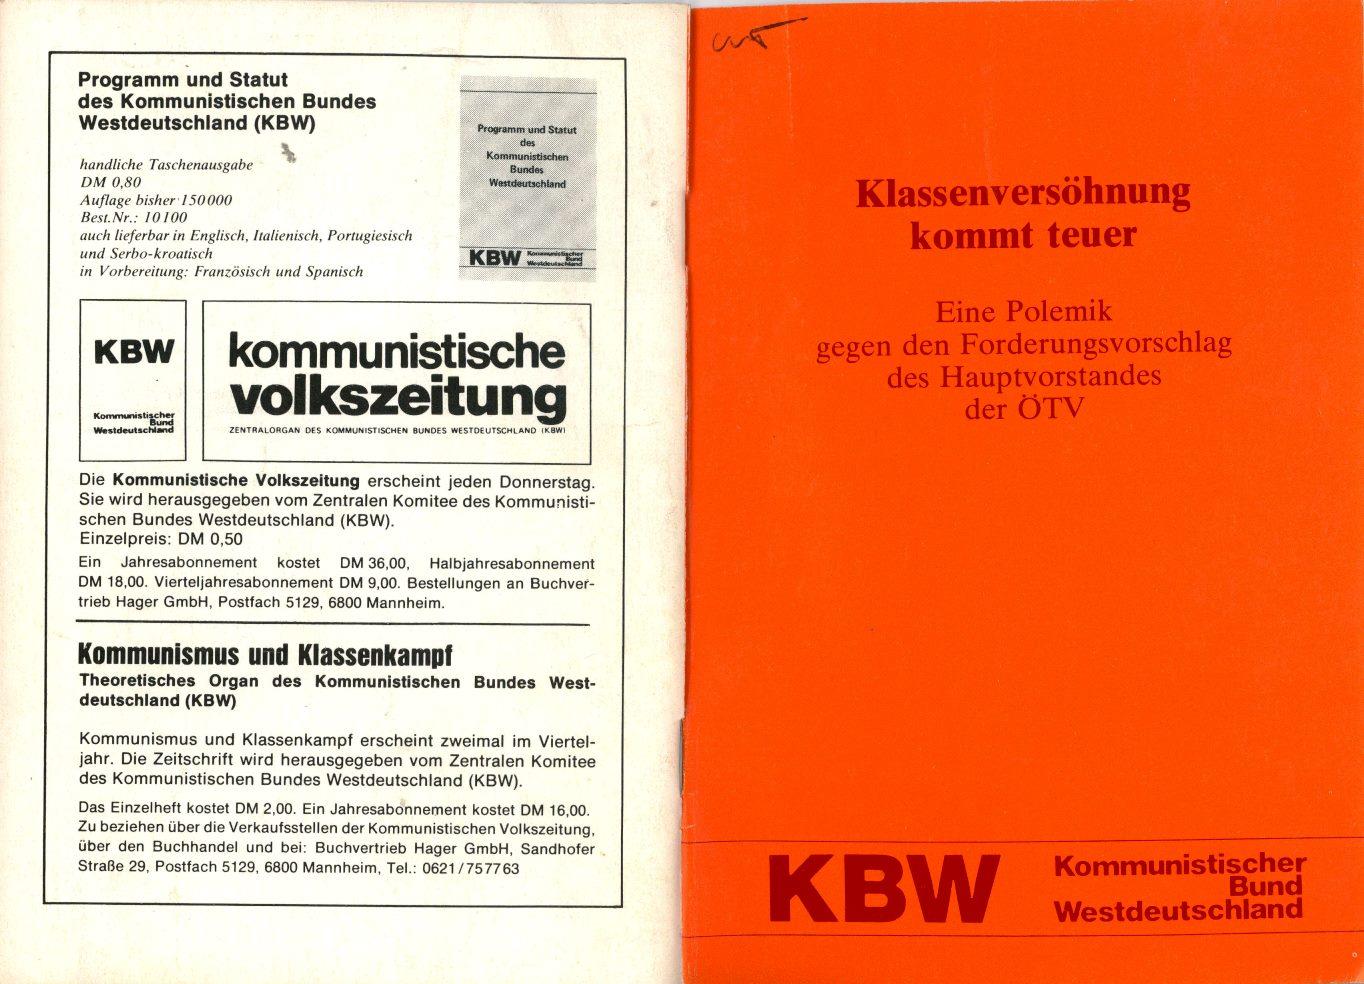 OTV_KBW_Klassenversoehnung_1976_01